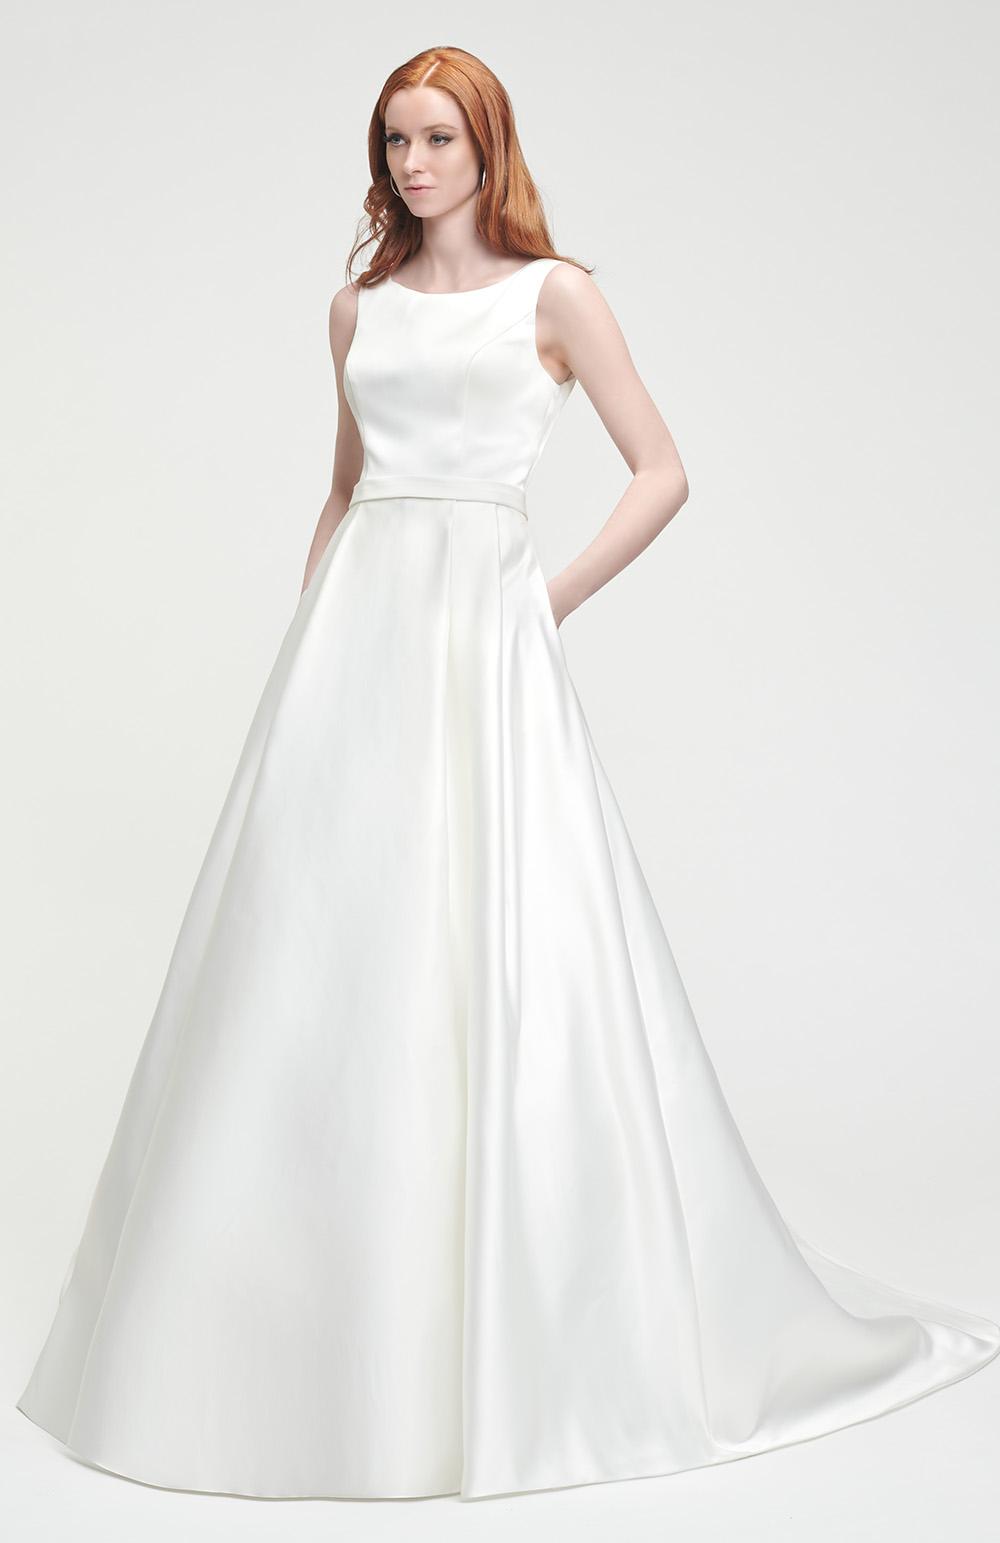 Robe de mariée Modèle Oxana